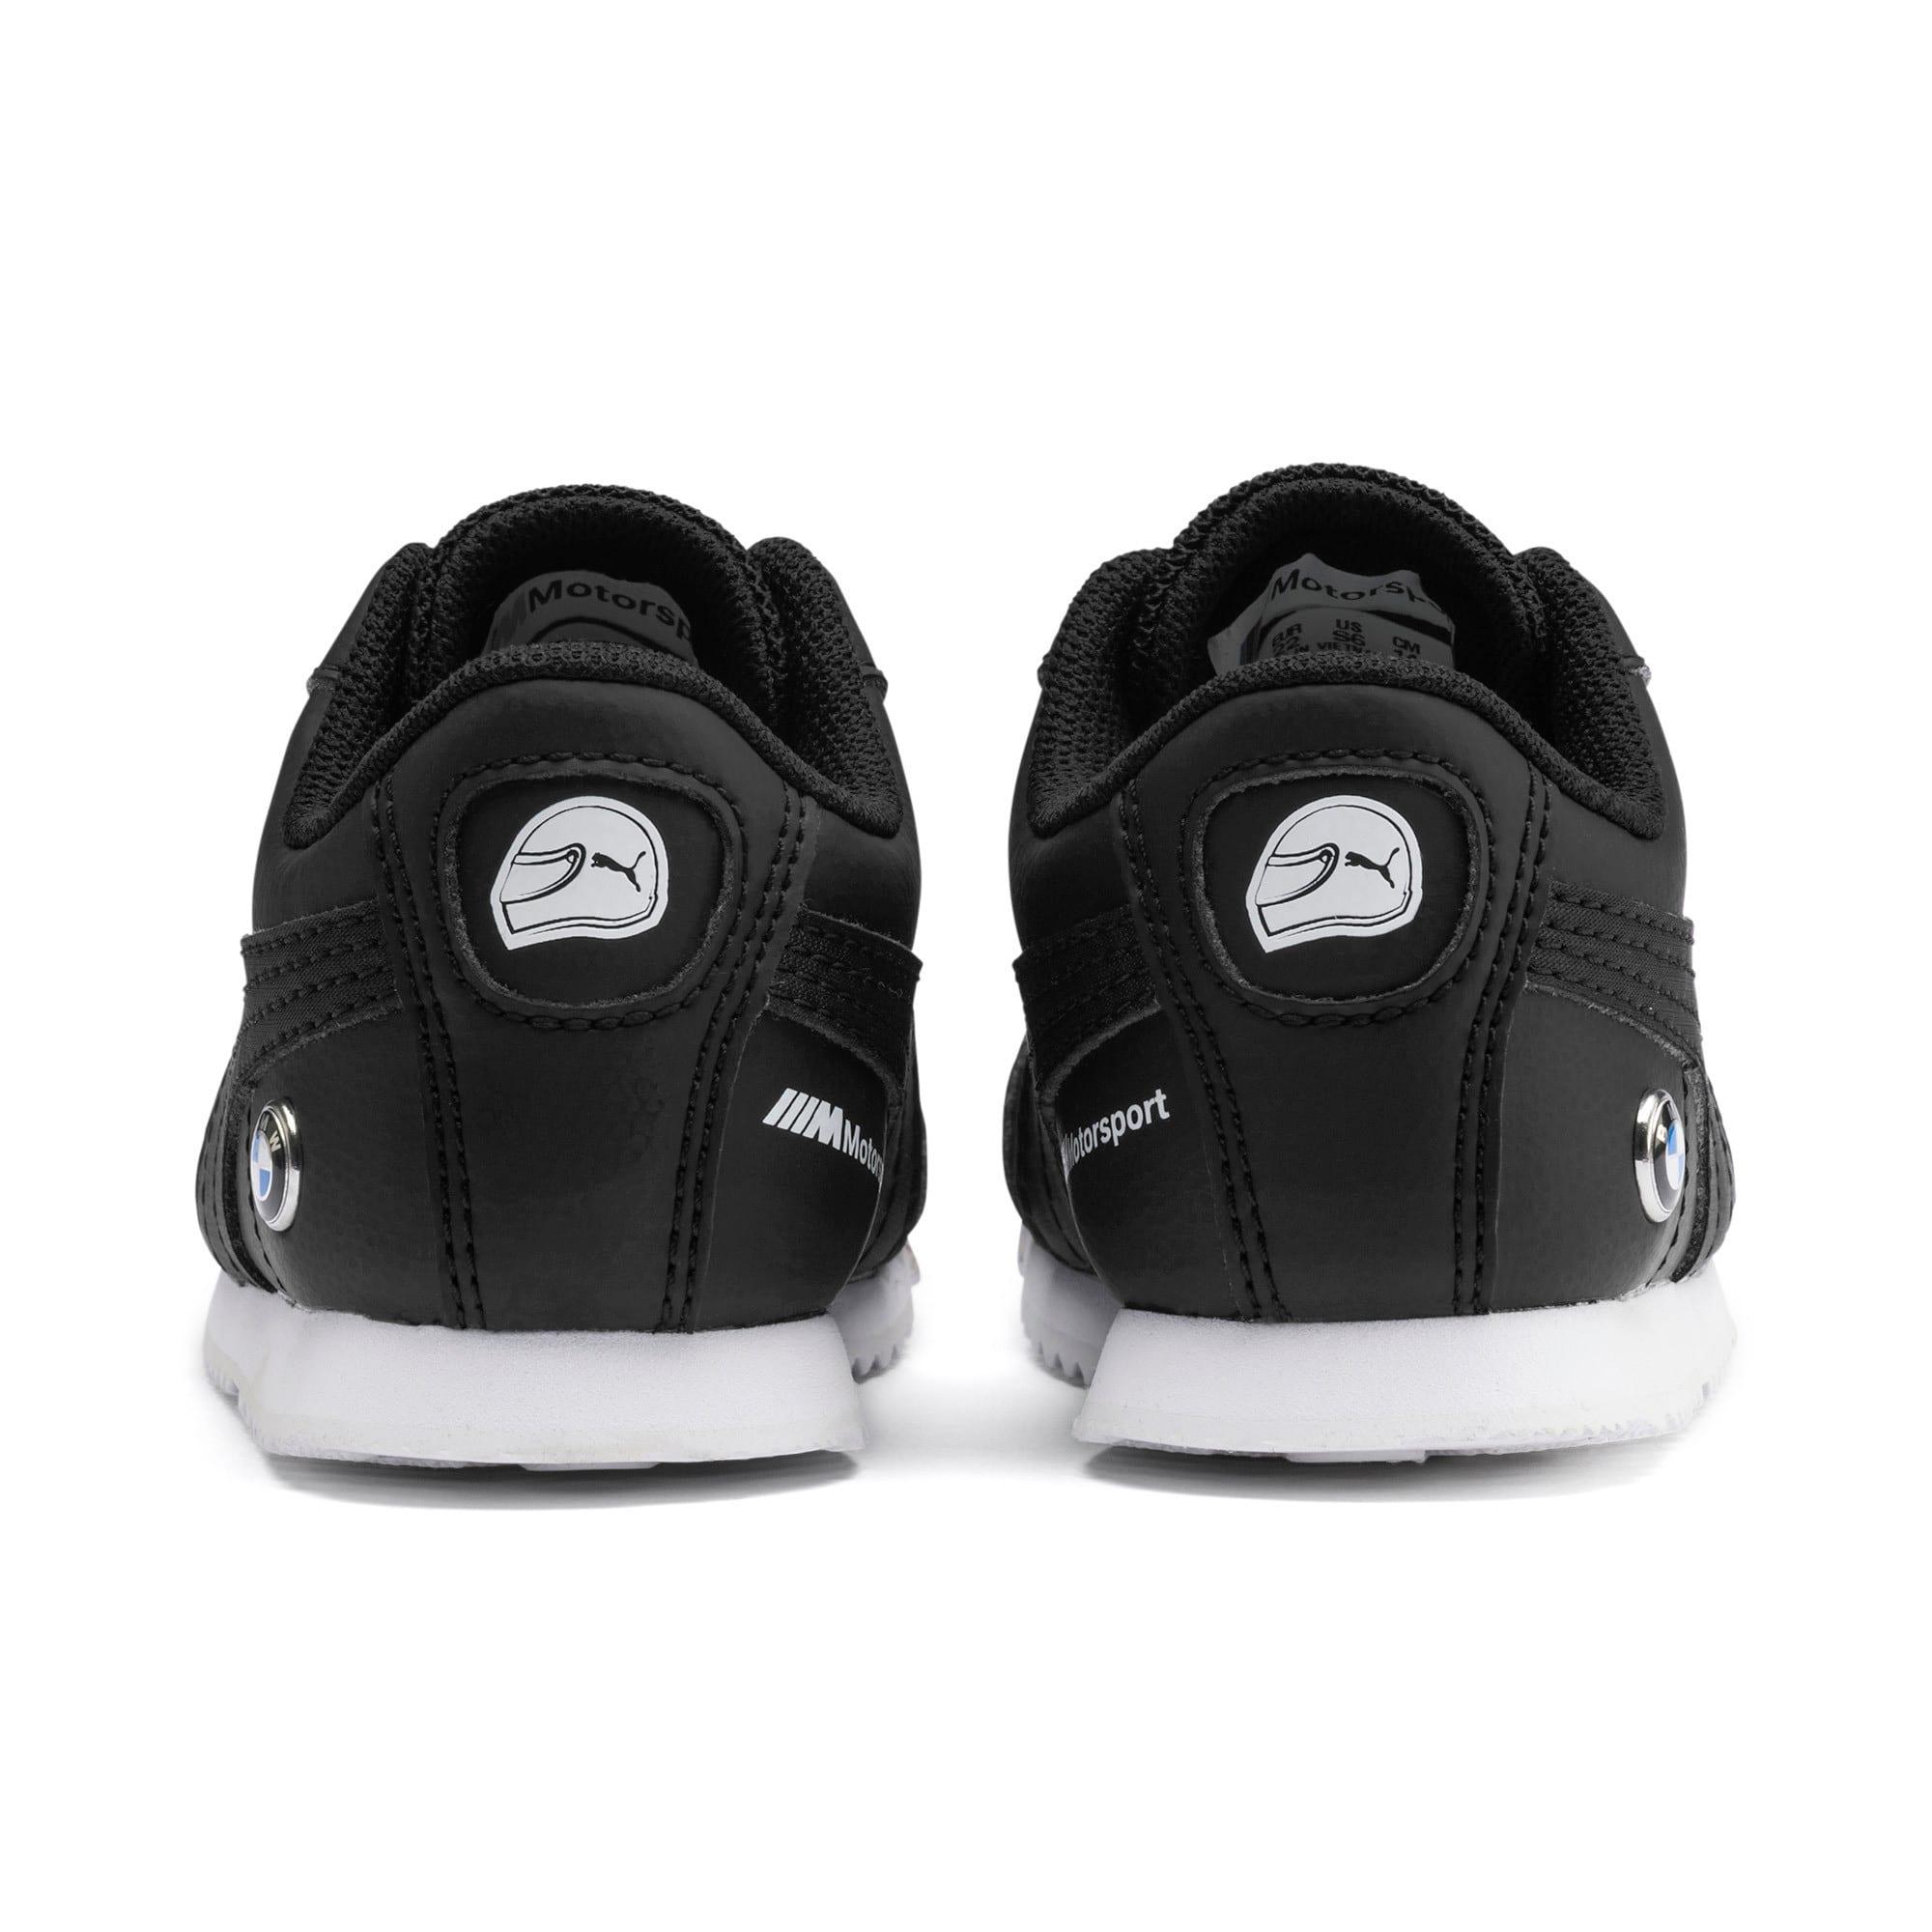 Thumbnail 3 of BMW M Motorsport Roma Toddler Shoes, Puma Black-Puma Black, medium